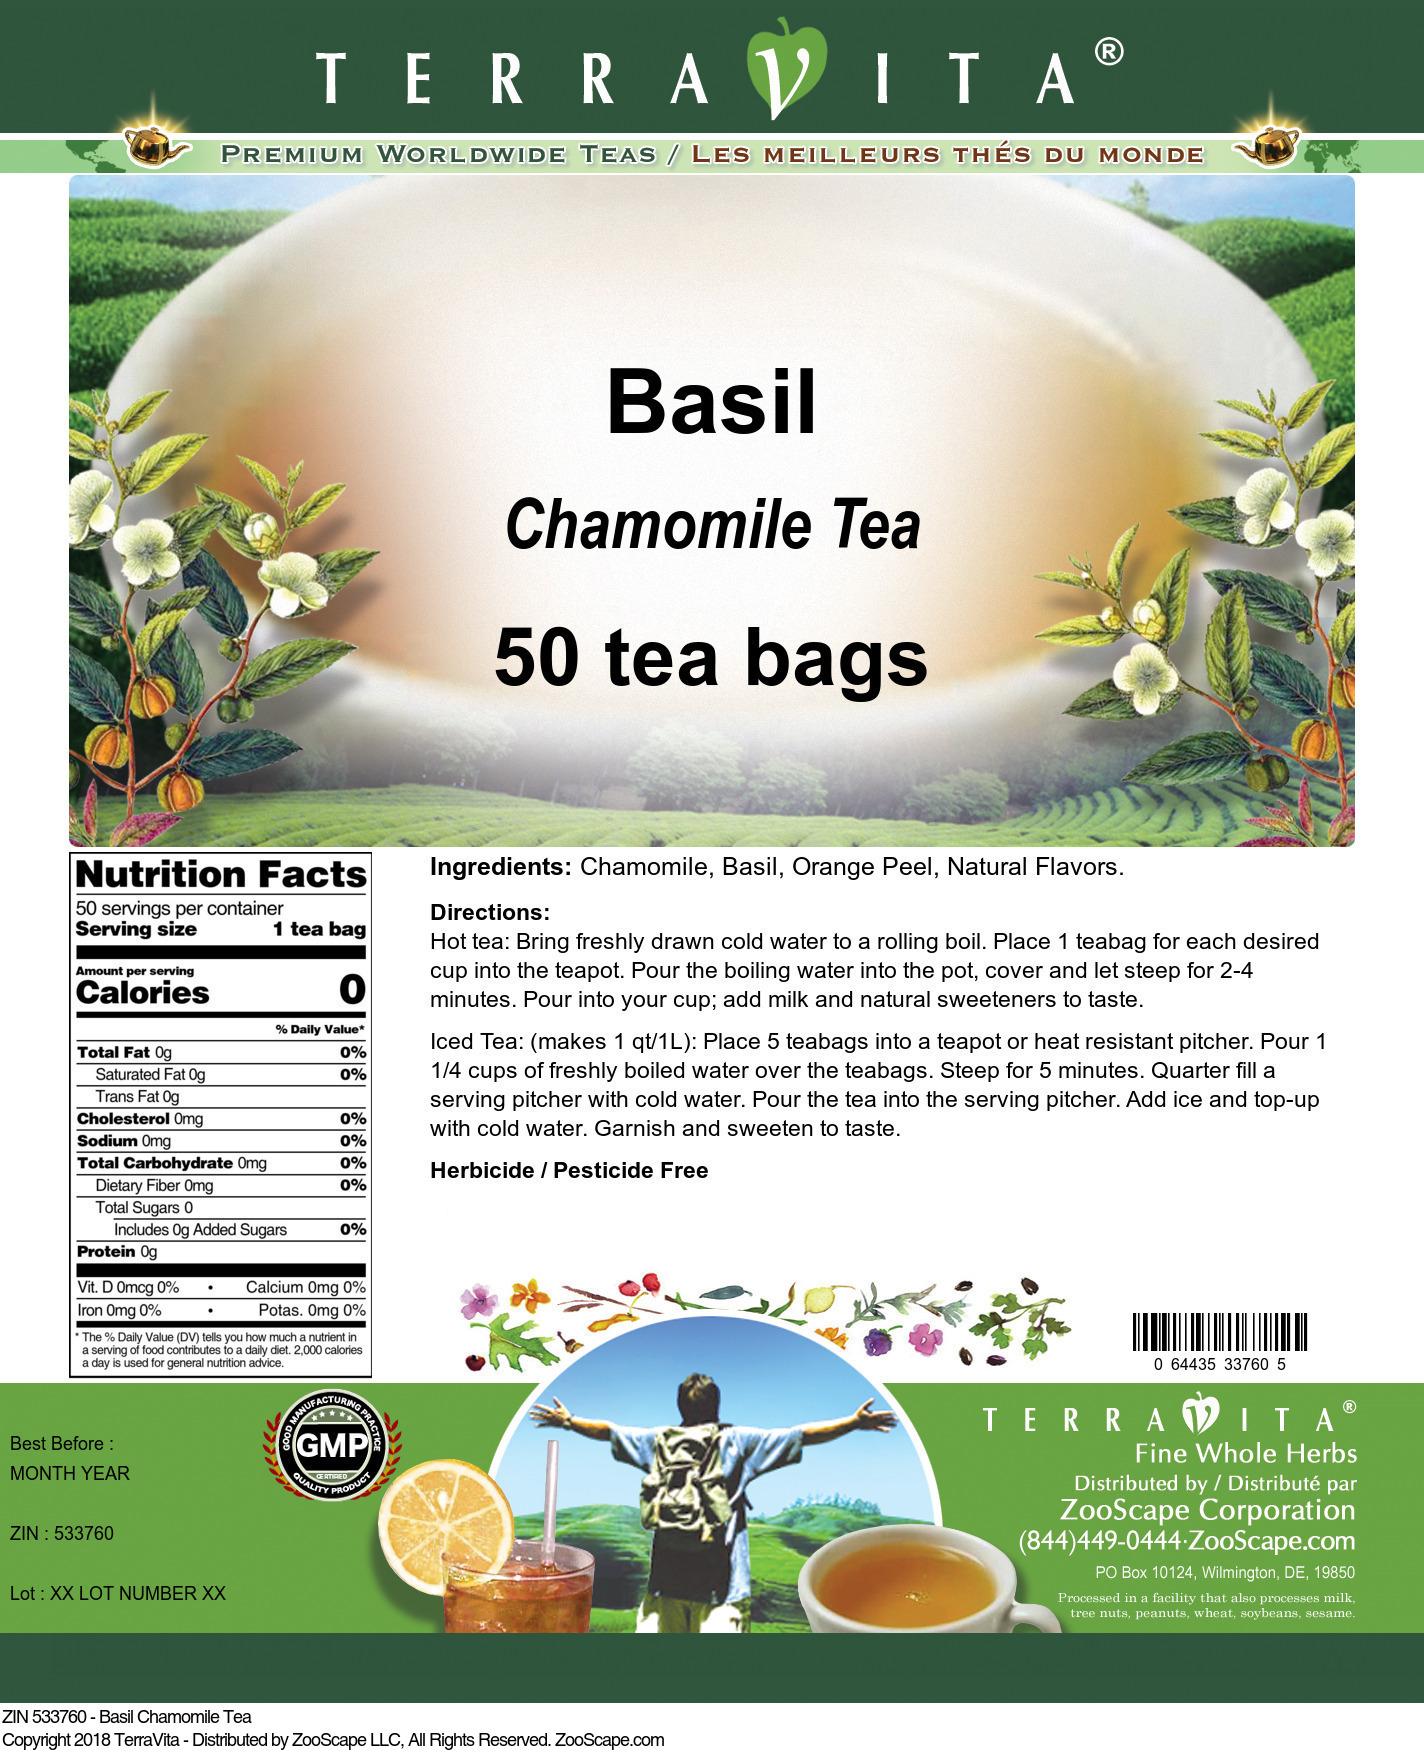 Basil Chamomile Tea